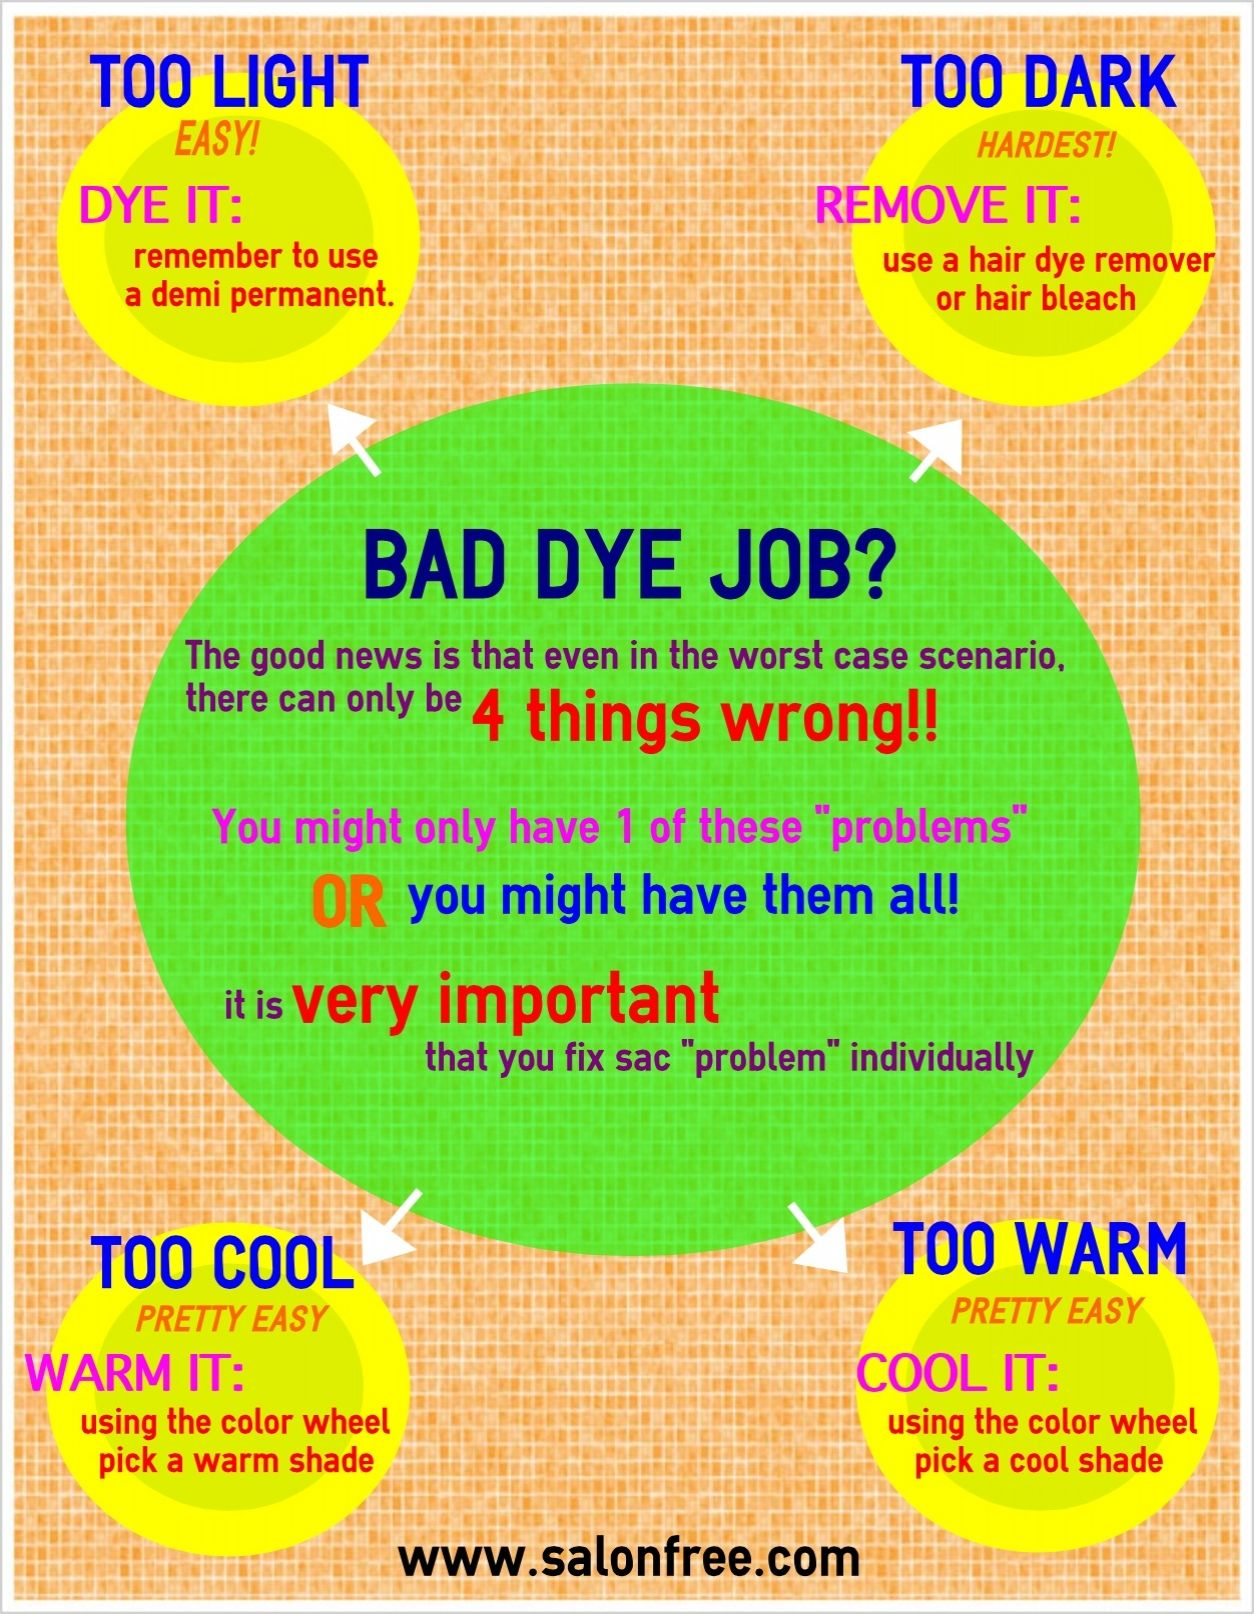 Bad Dye Job? | salonfree®